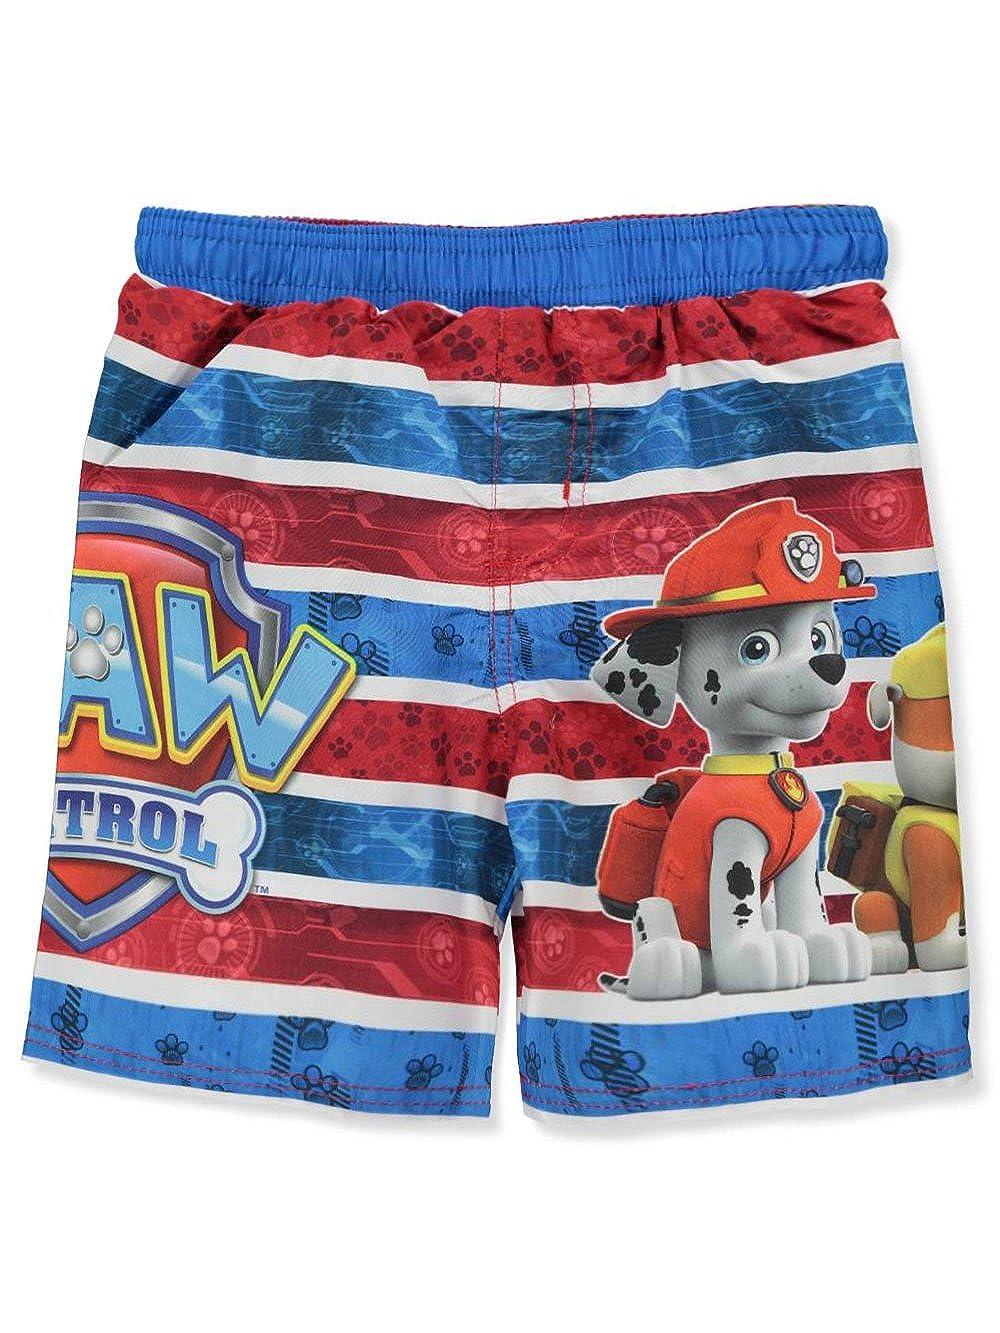 Paw Patrol Little Boys' Toddler Boardshorts - blue/multi, 2t